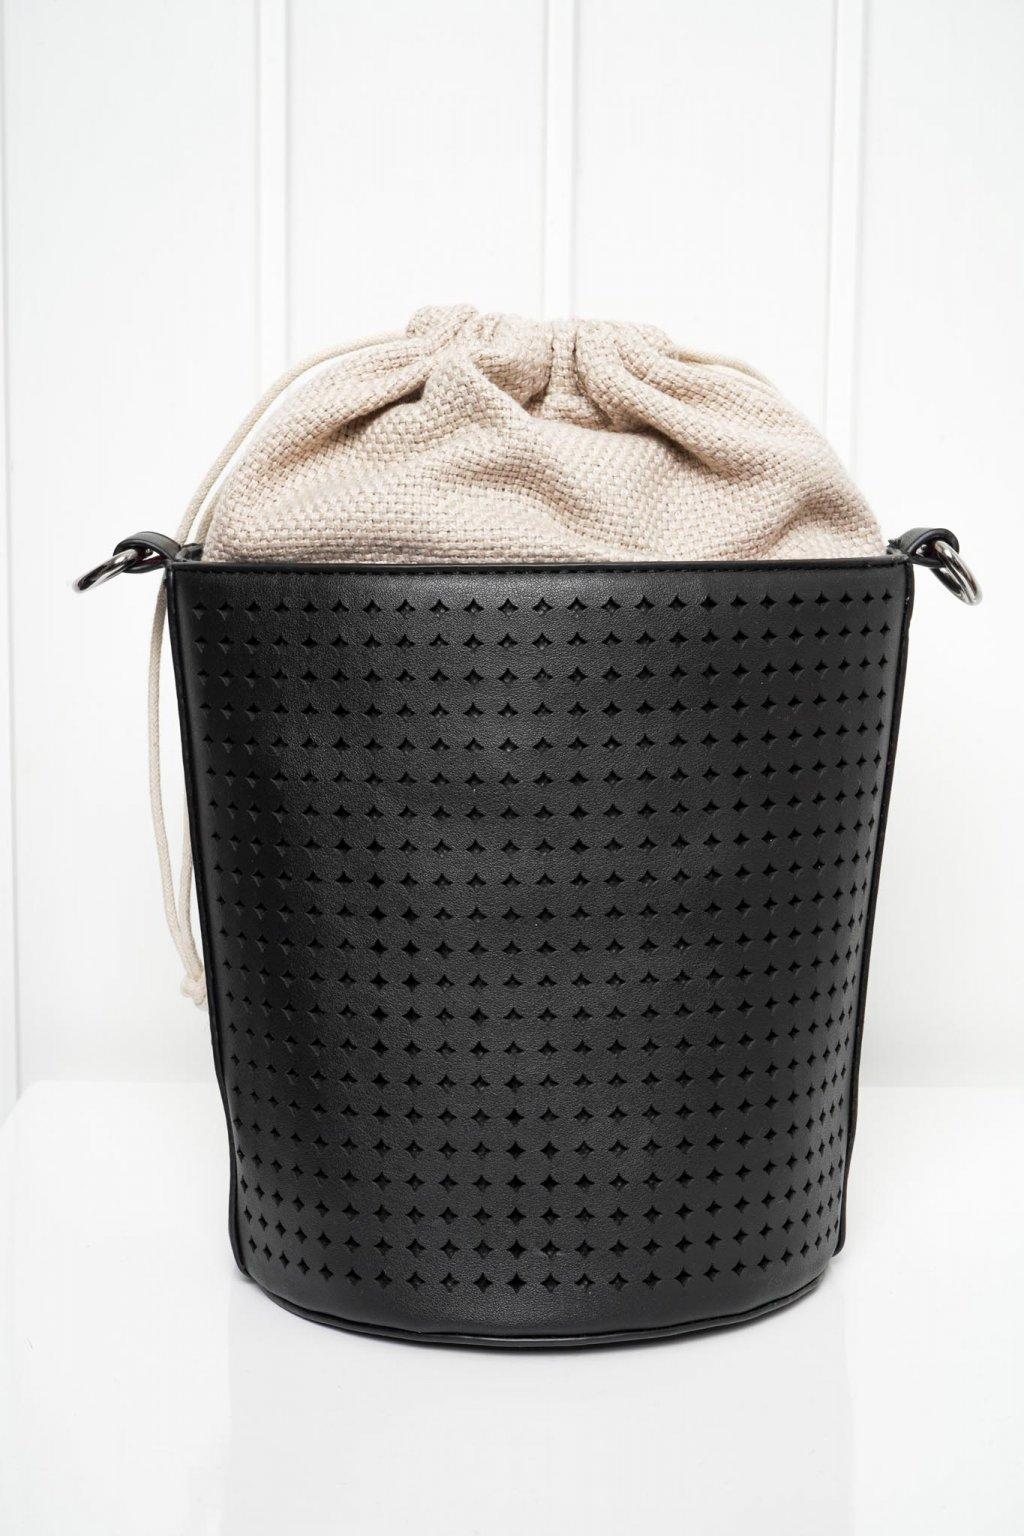 Kabelka, crossbody, ruksak, shopping bag, shopperka, 278